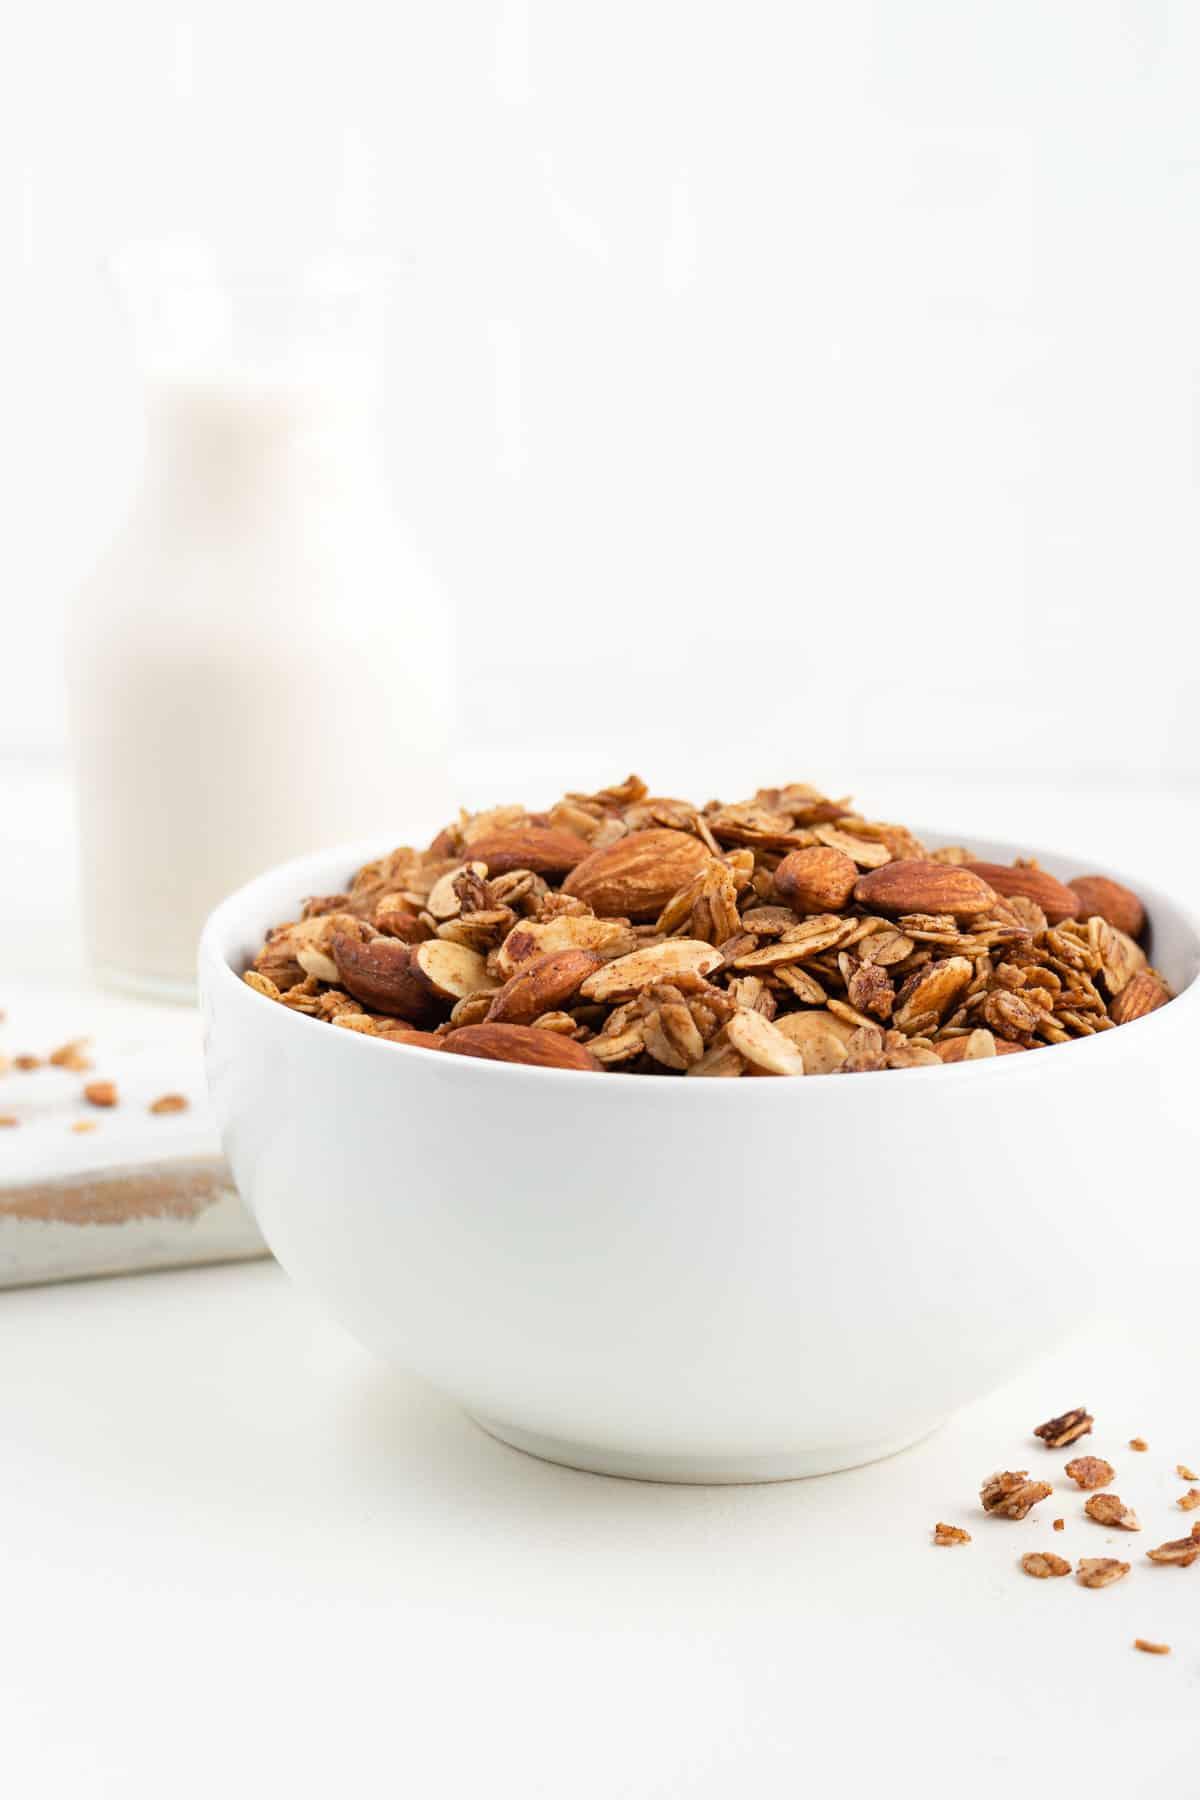 vanilla almond granola in a white bowl beside a glass of milk